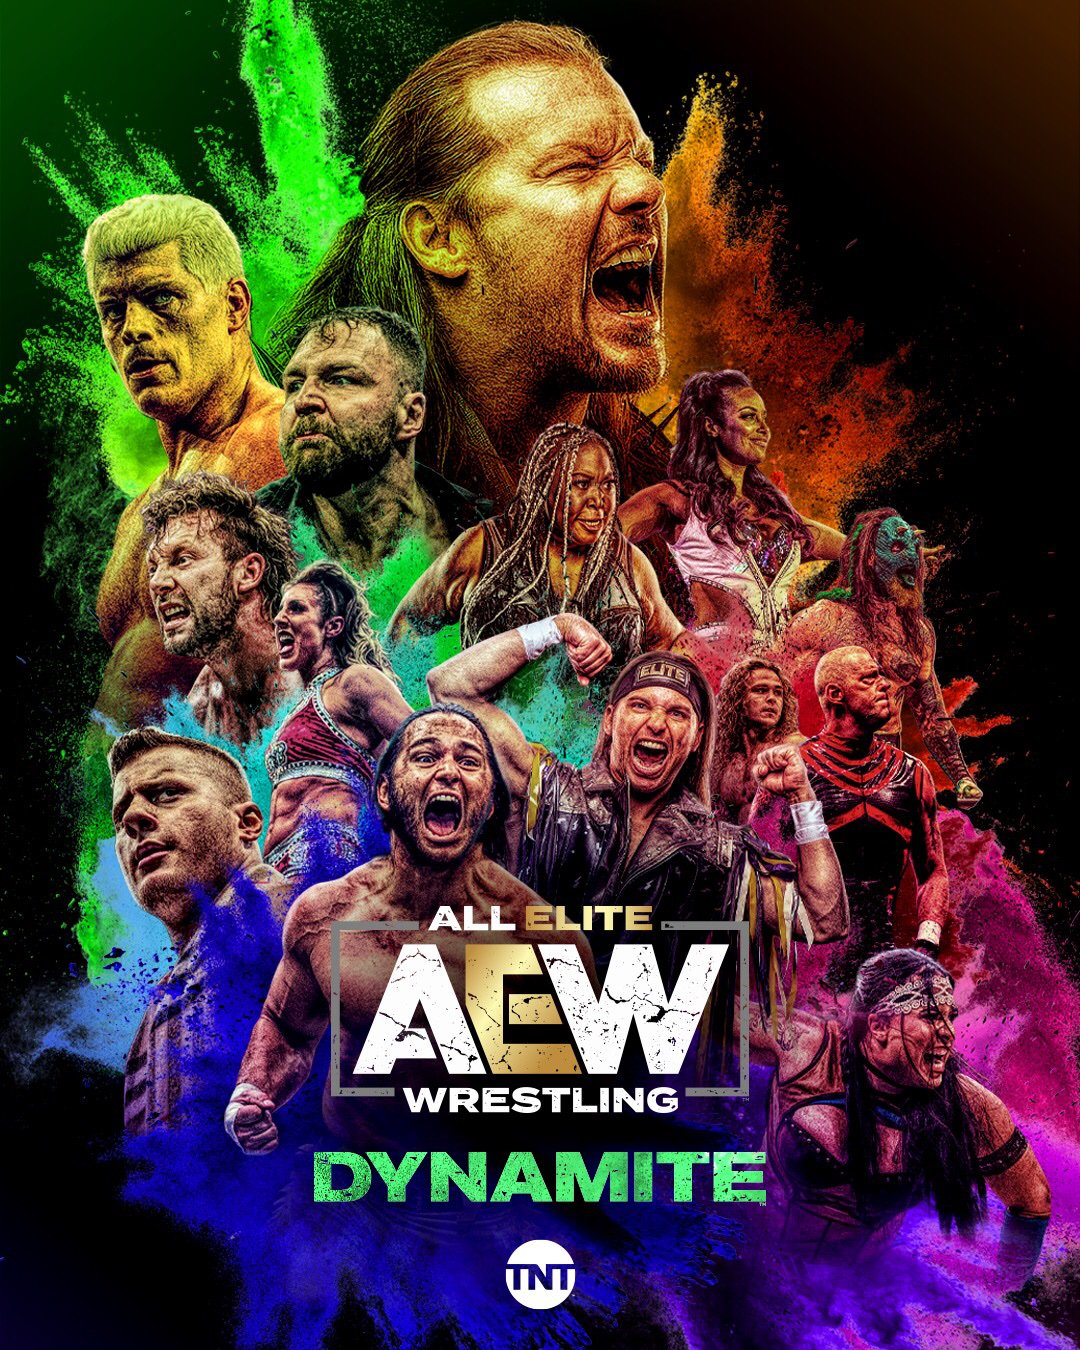 AEW Announces 'AEW DYNAMITE' – No News on Canada, Australia or The UK TV – Other AEW Bits